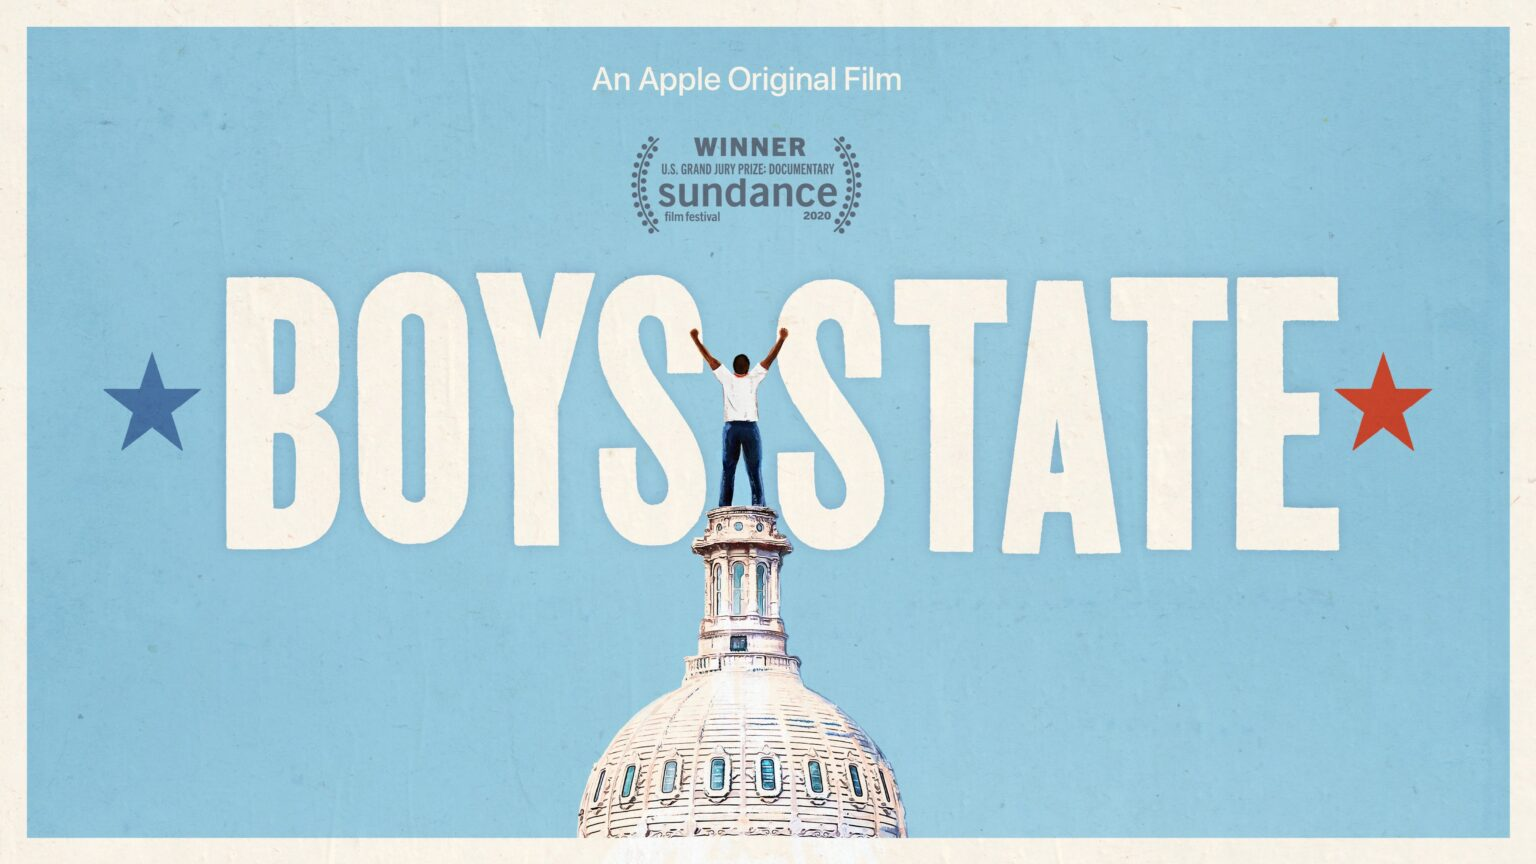 First Boys State trailer makes politics look fun.